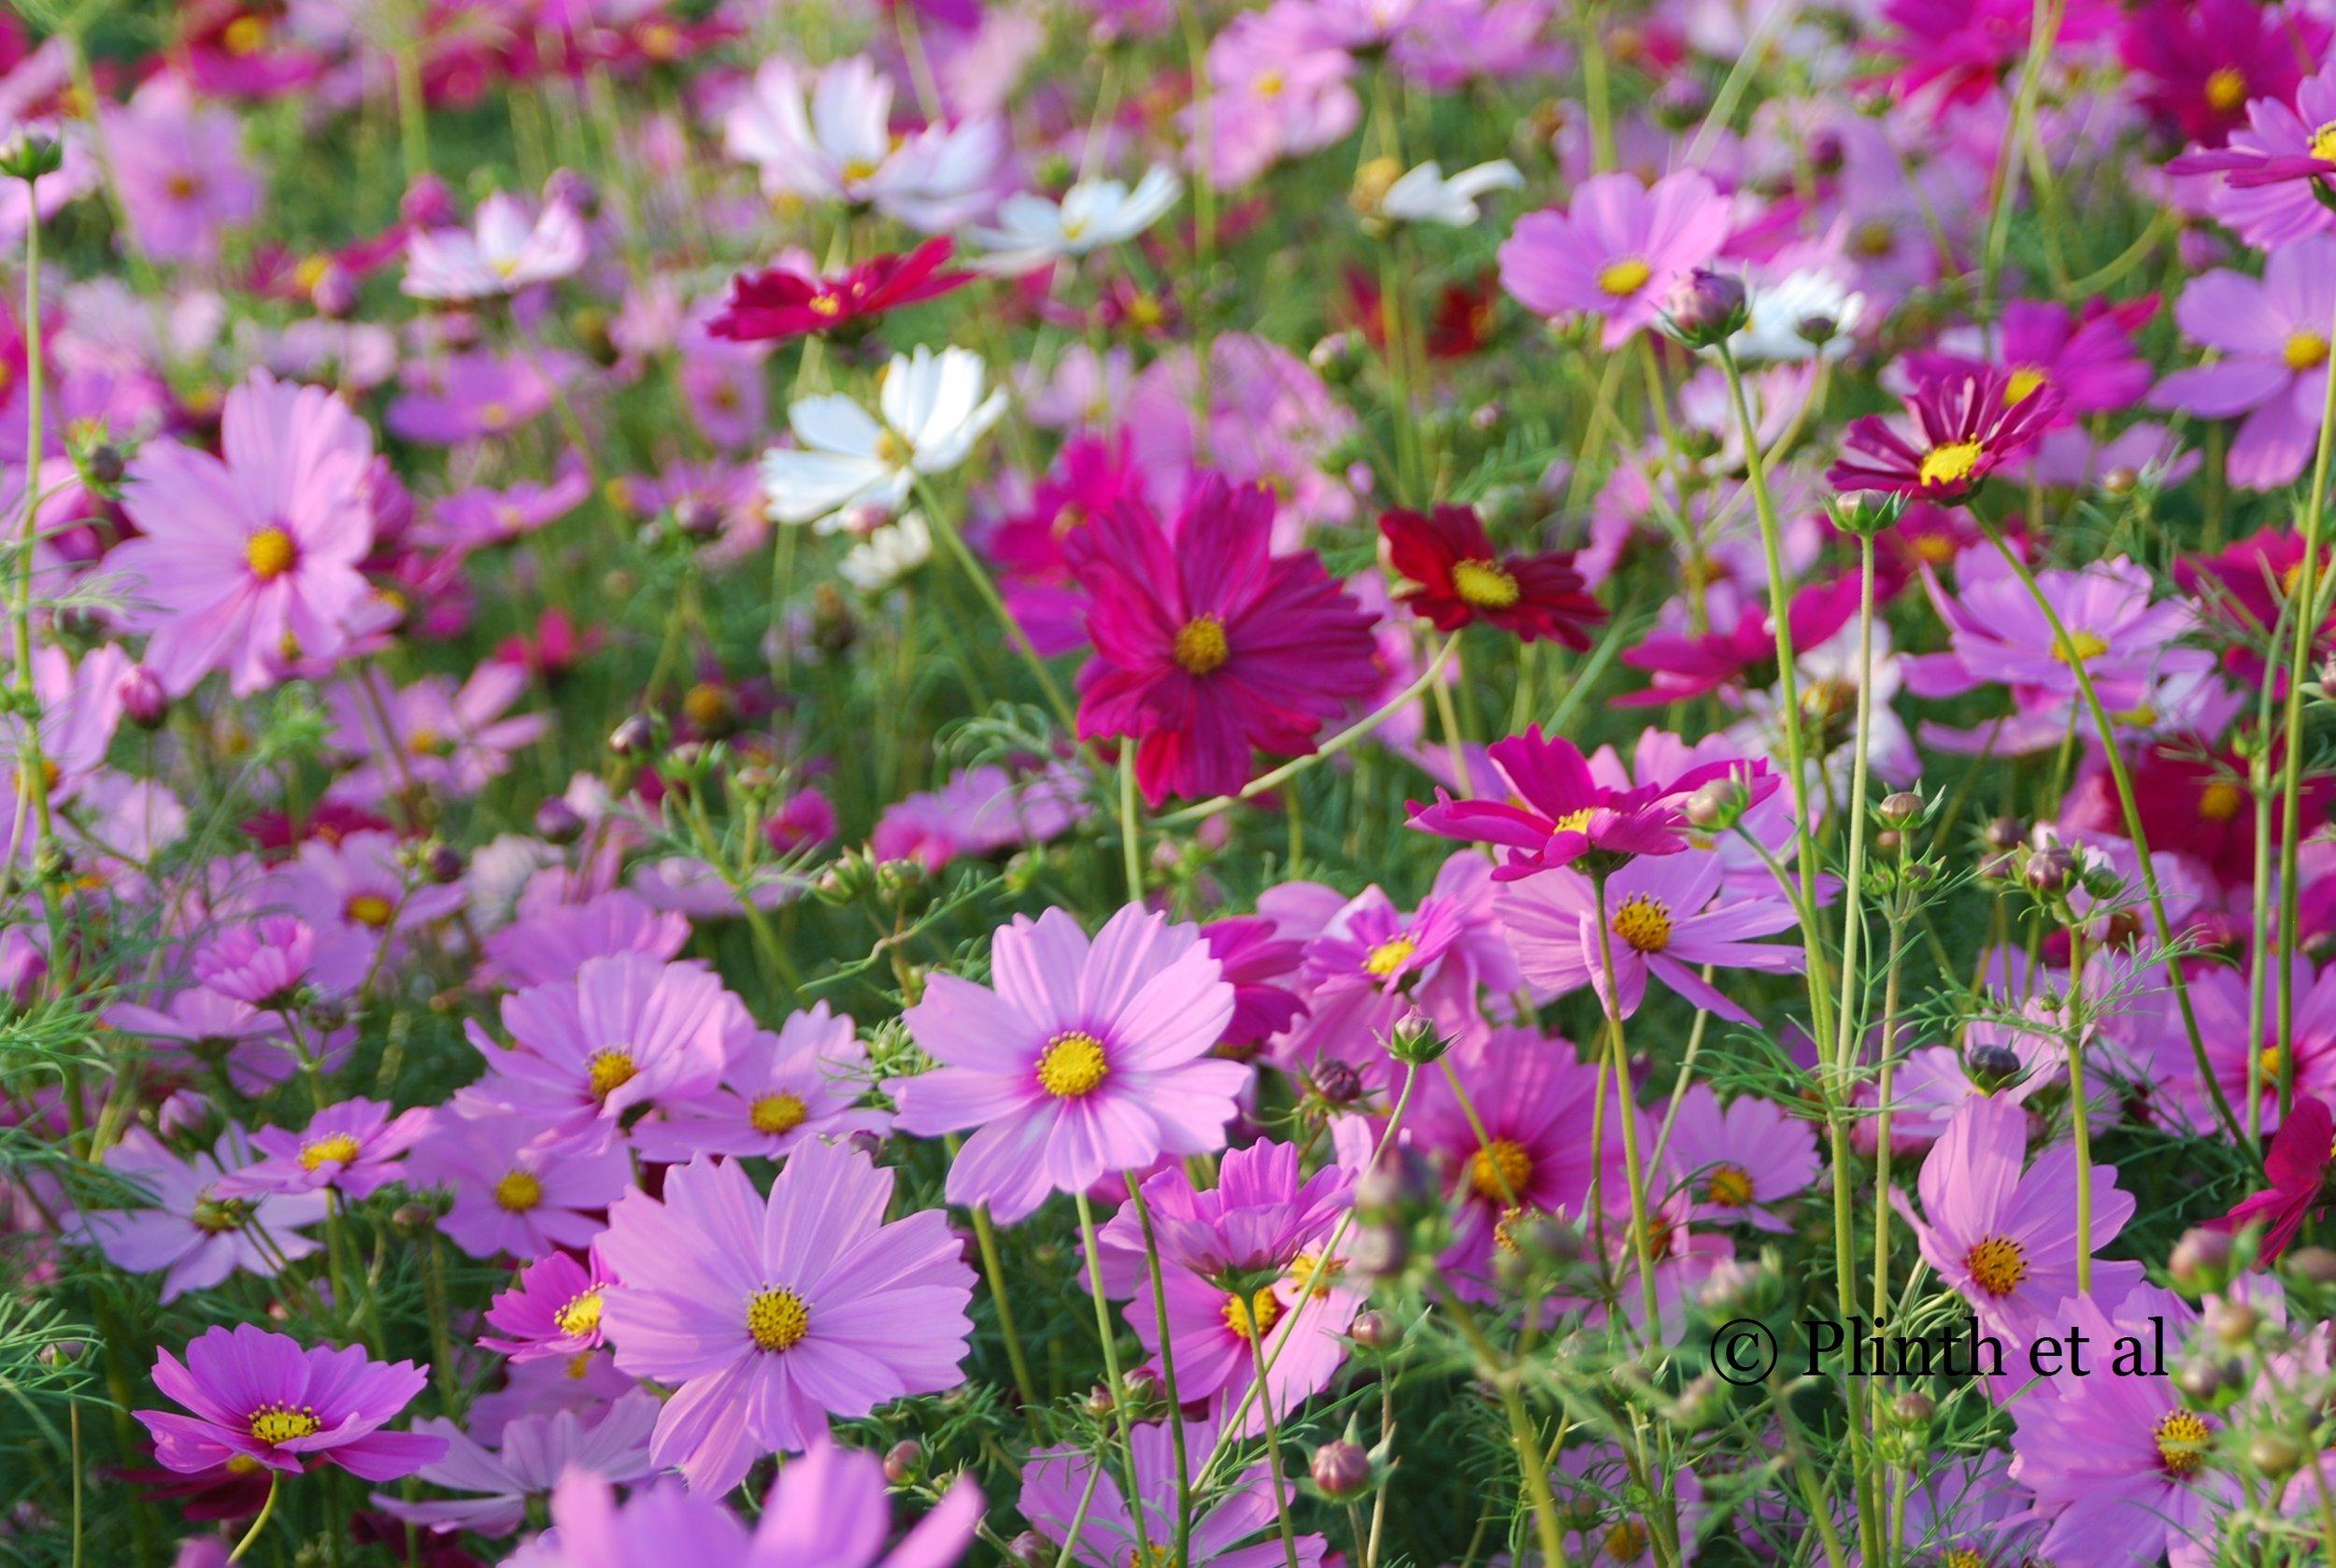 Annuals for late summer plinth et al a field of cosmos bipinnatus in full flower izmirmasajfo